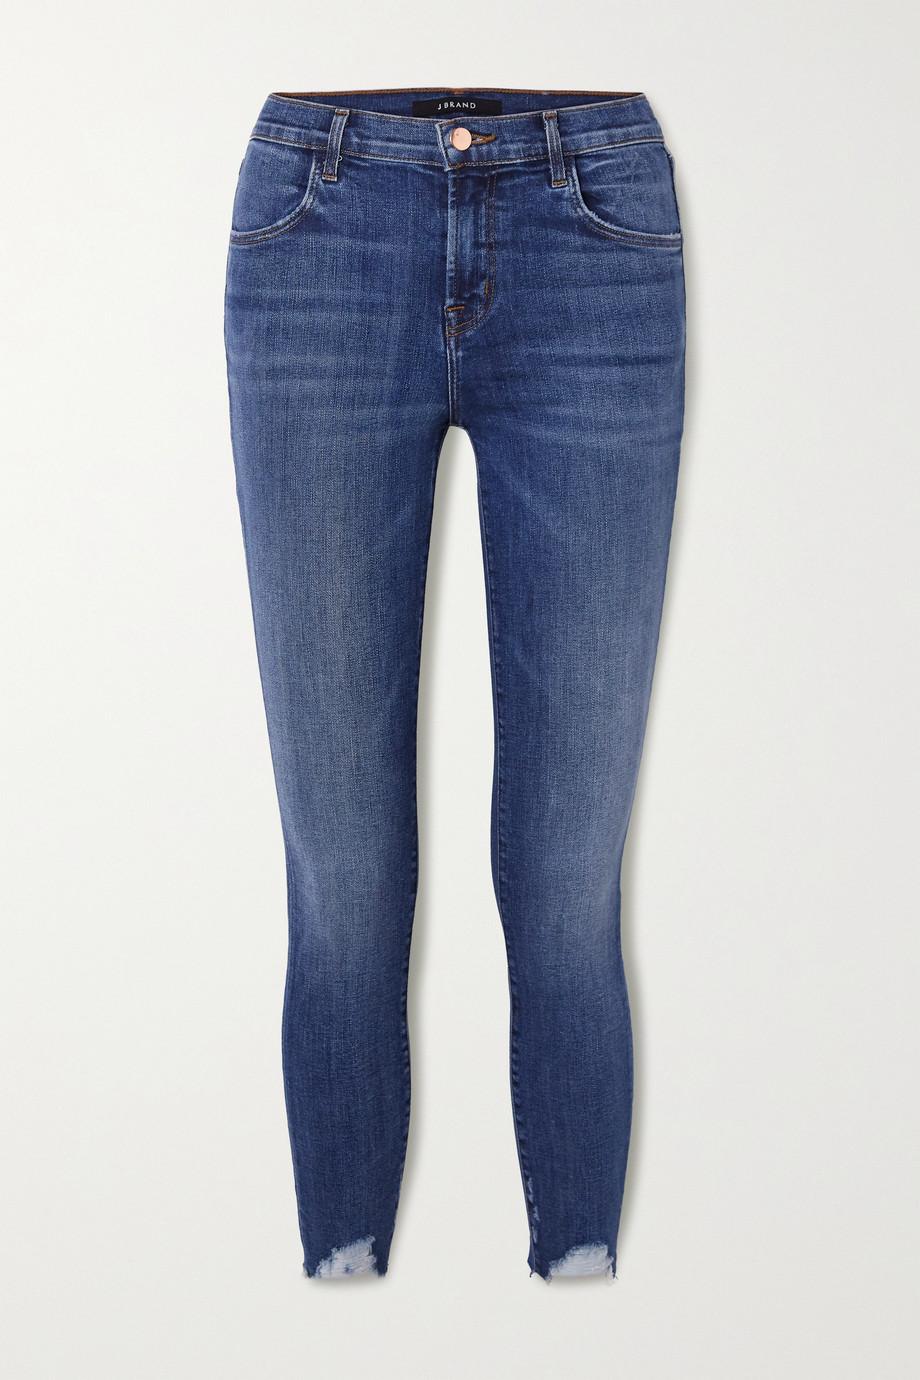 J Brand Alana distressed high-rise skinny jeans